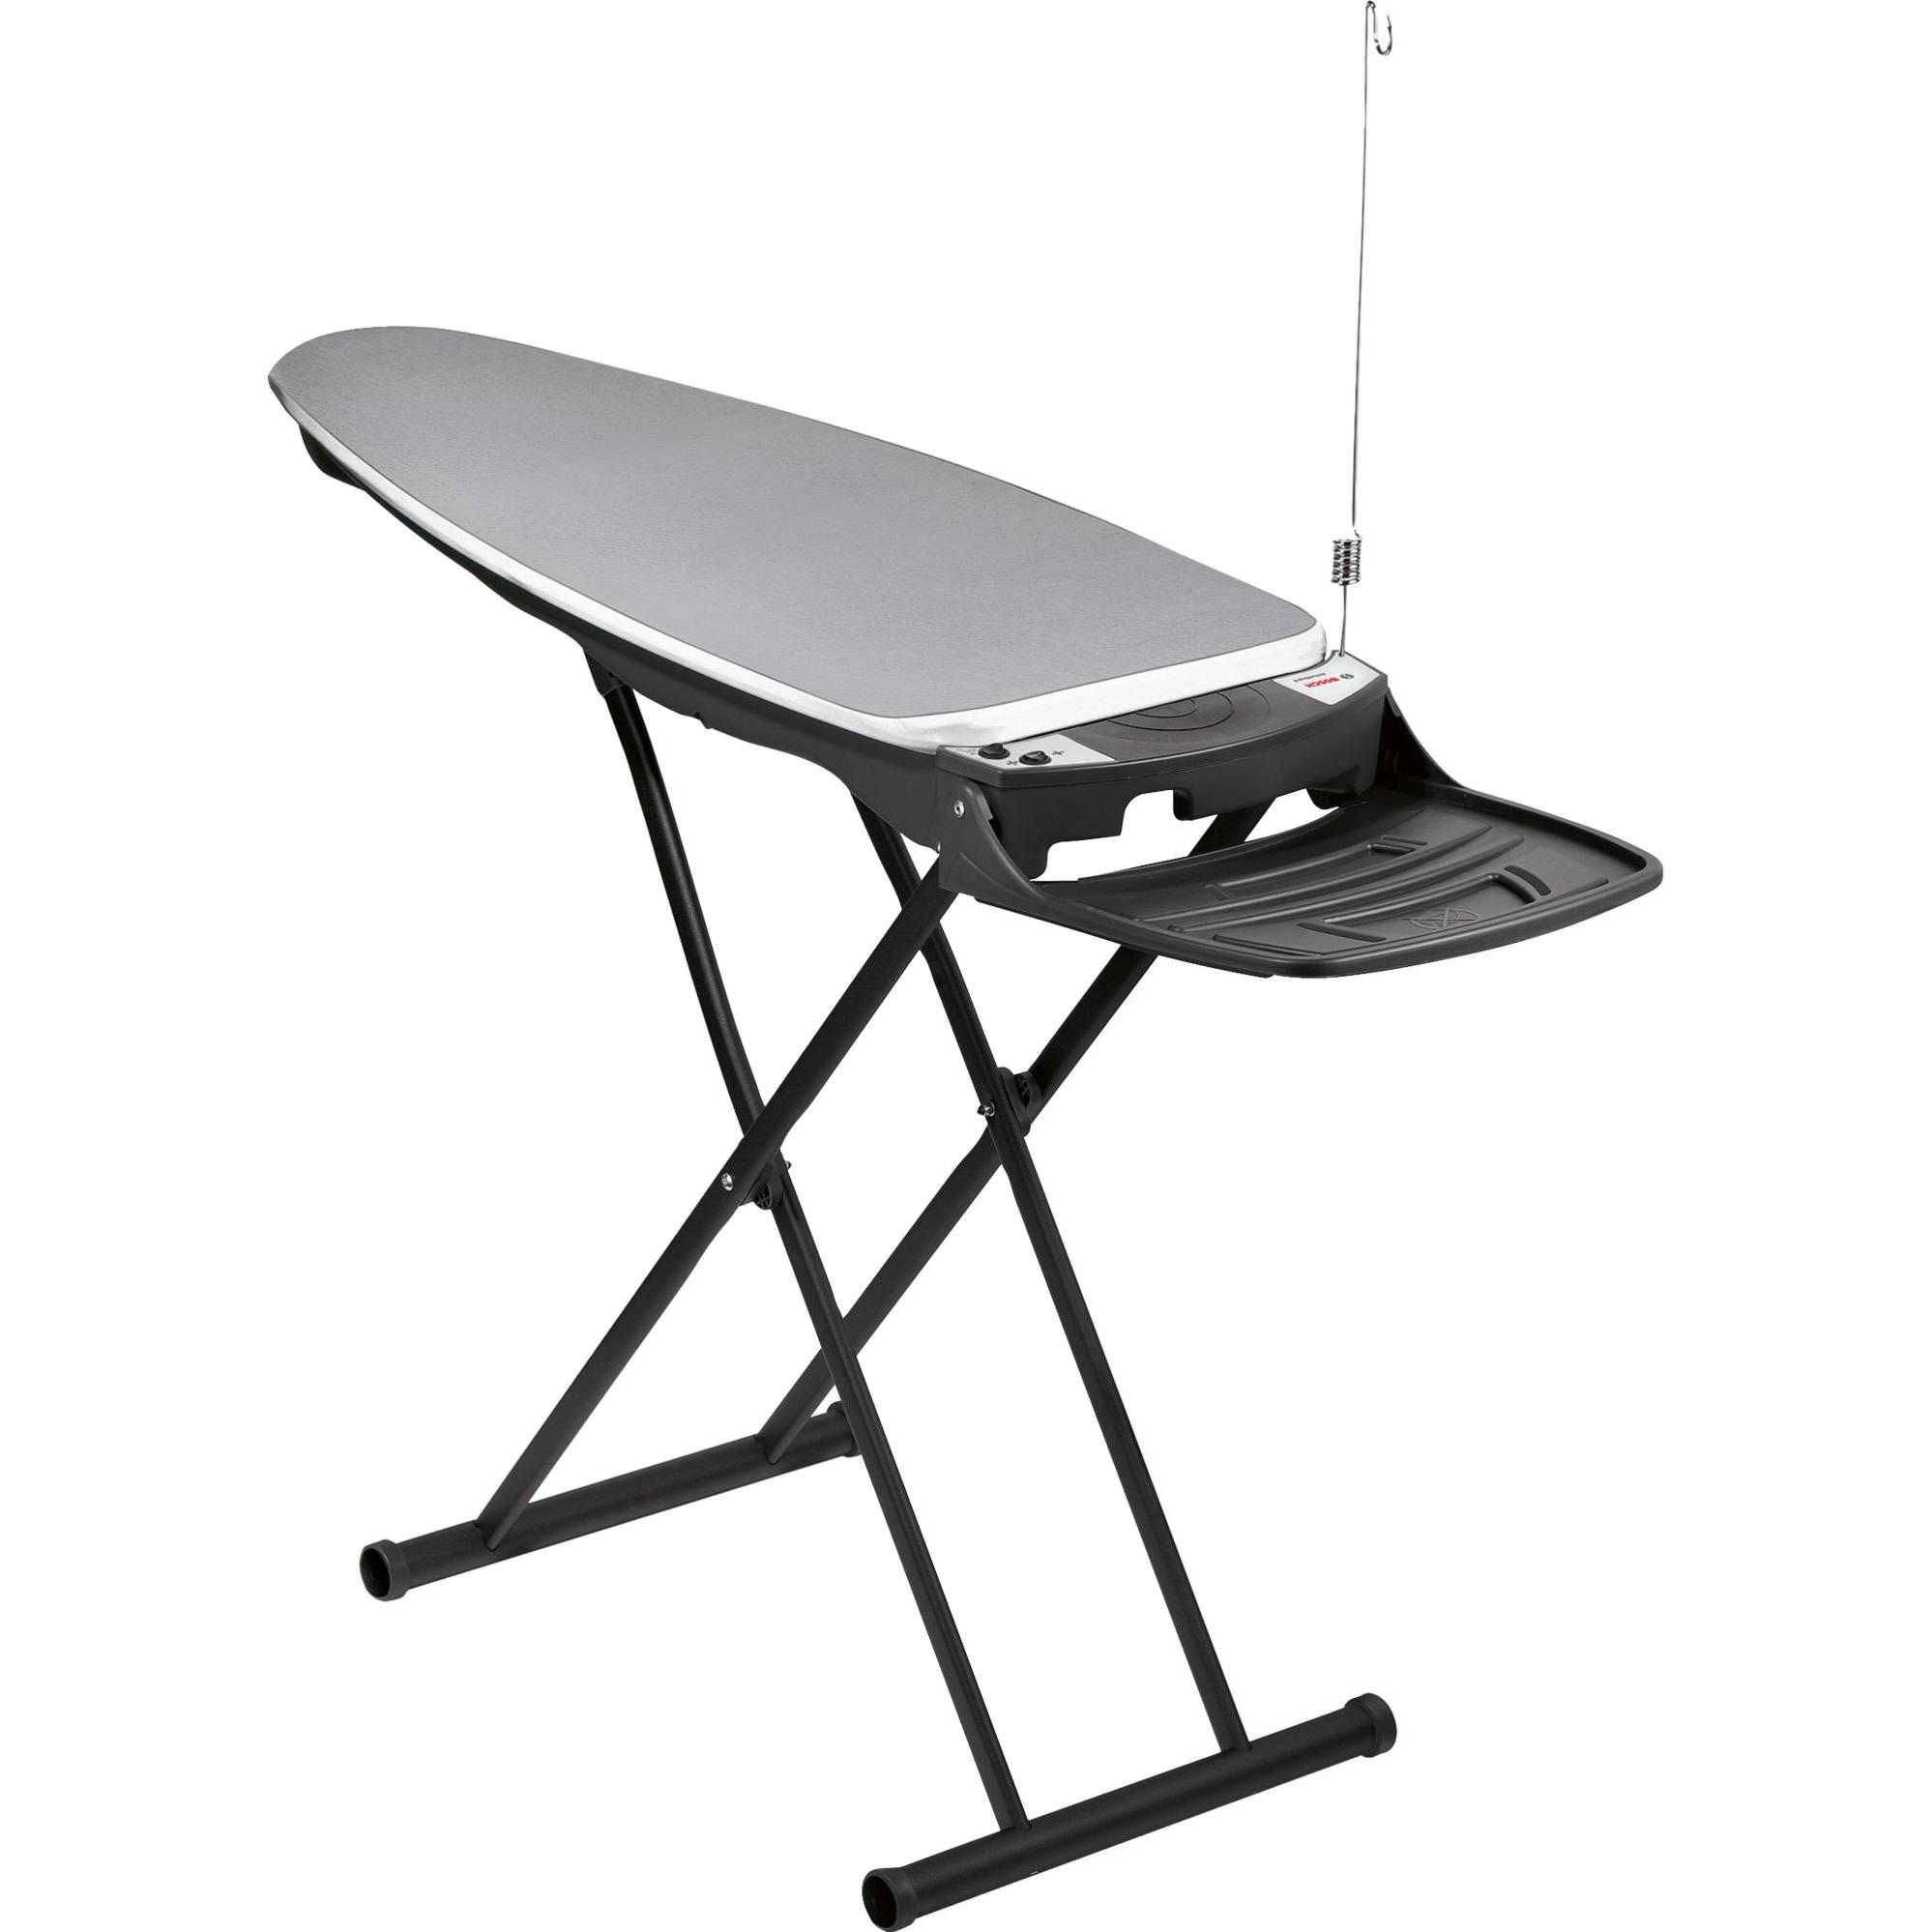 TDN1710 tabla de planchar 2050 x 800 mm